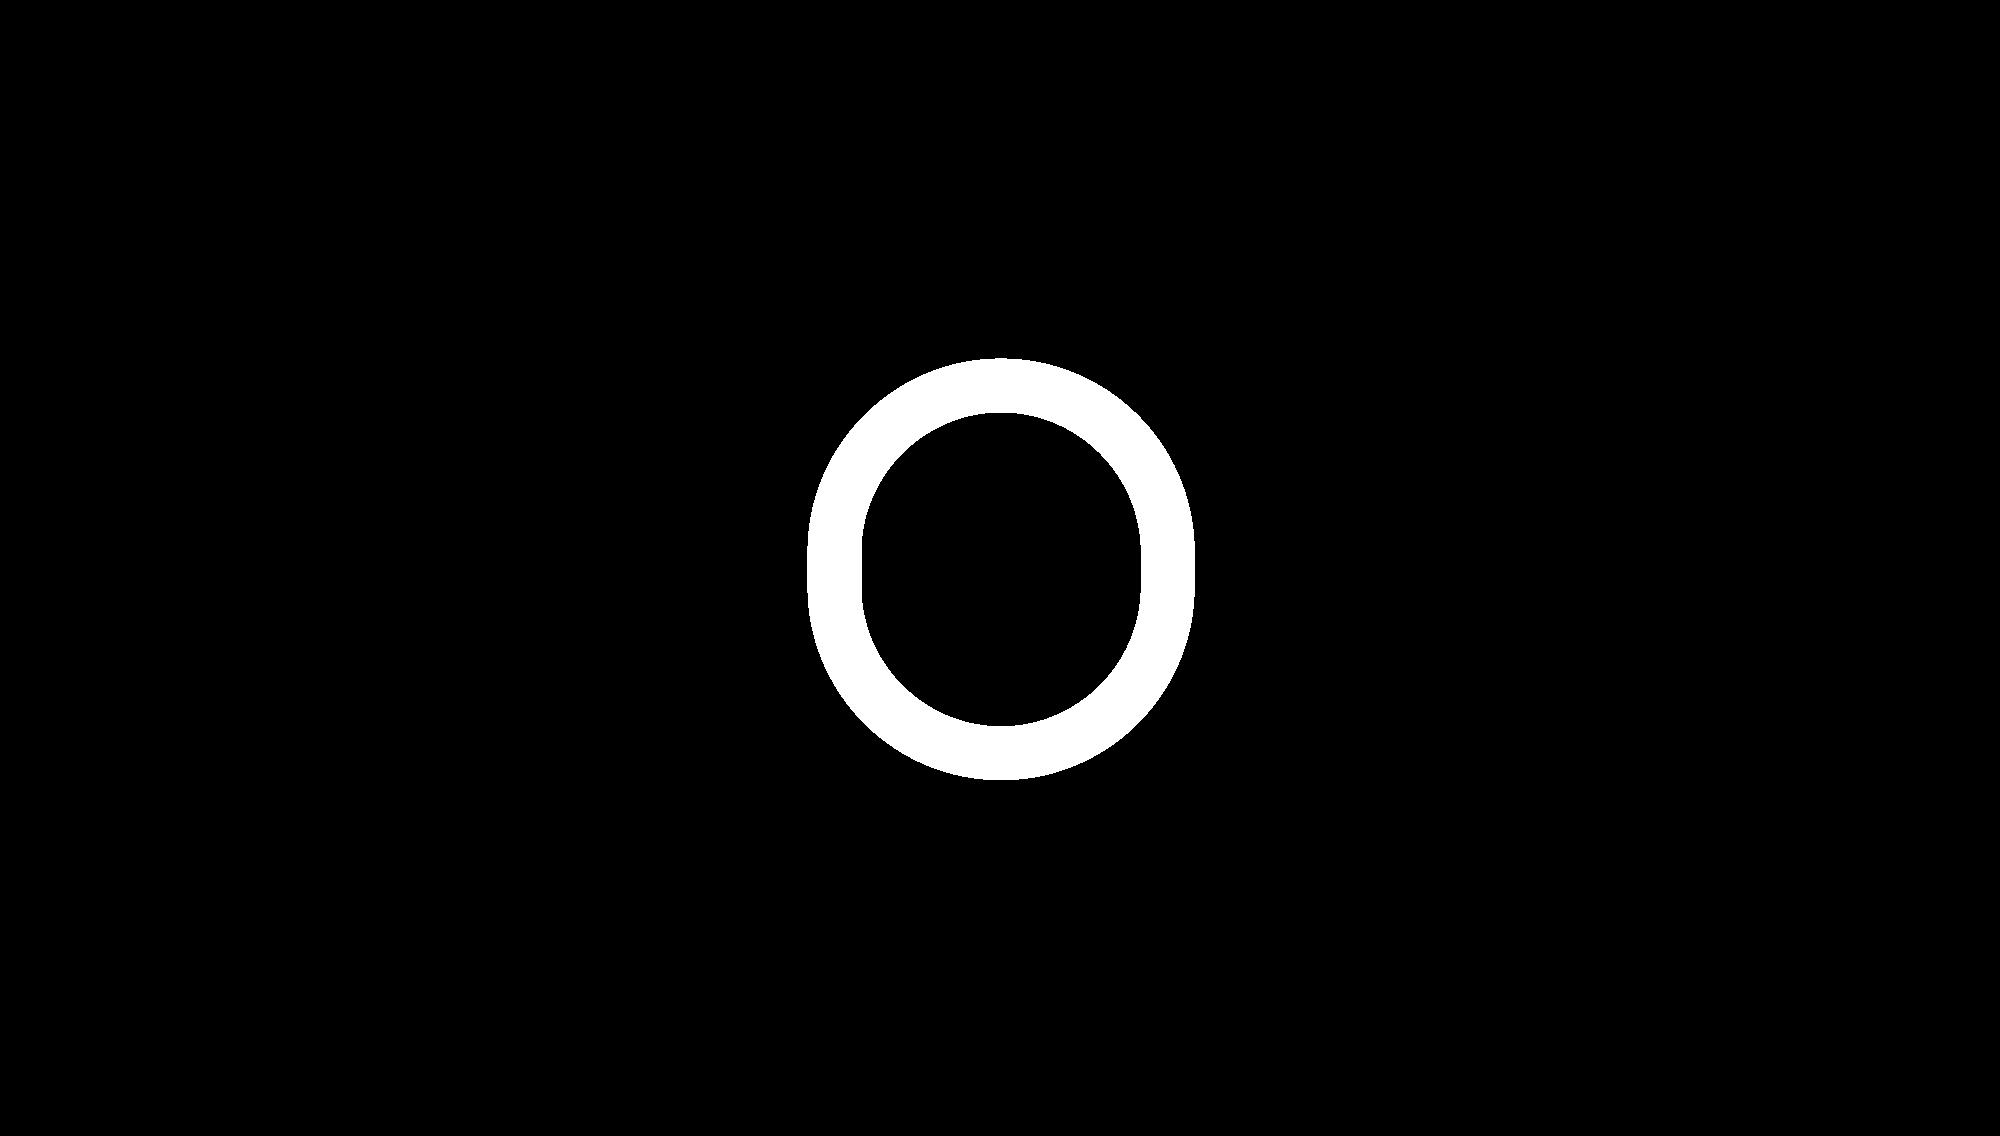 Omrania-logo-symbol-white-yastudio